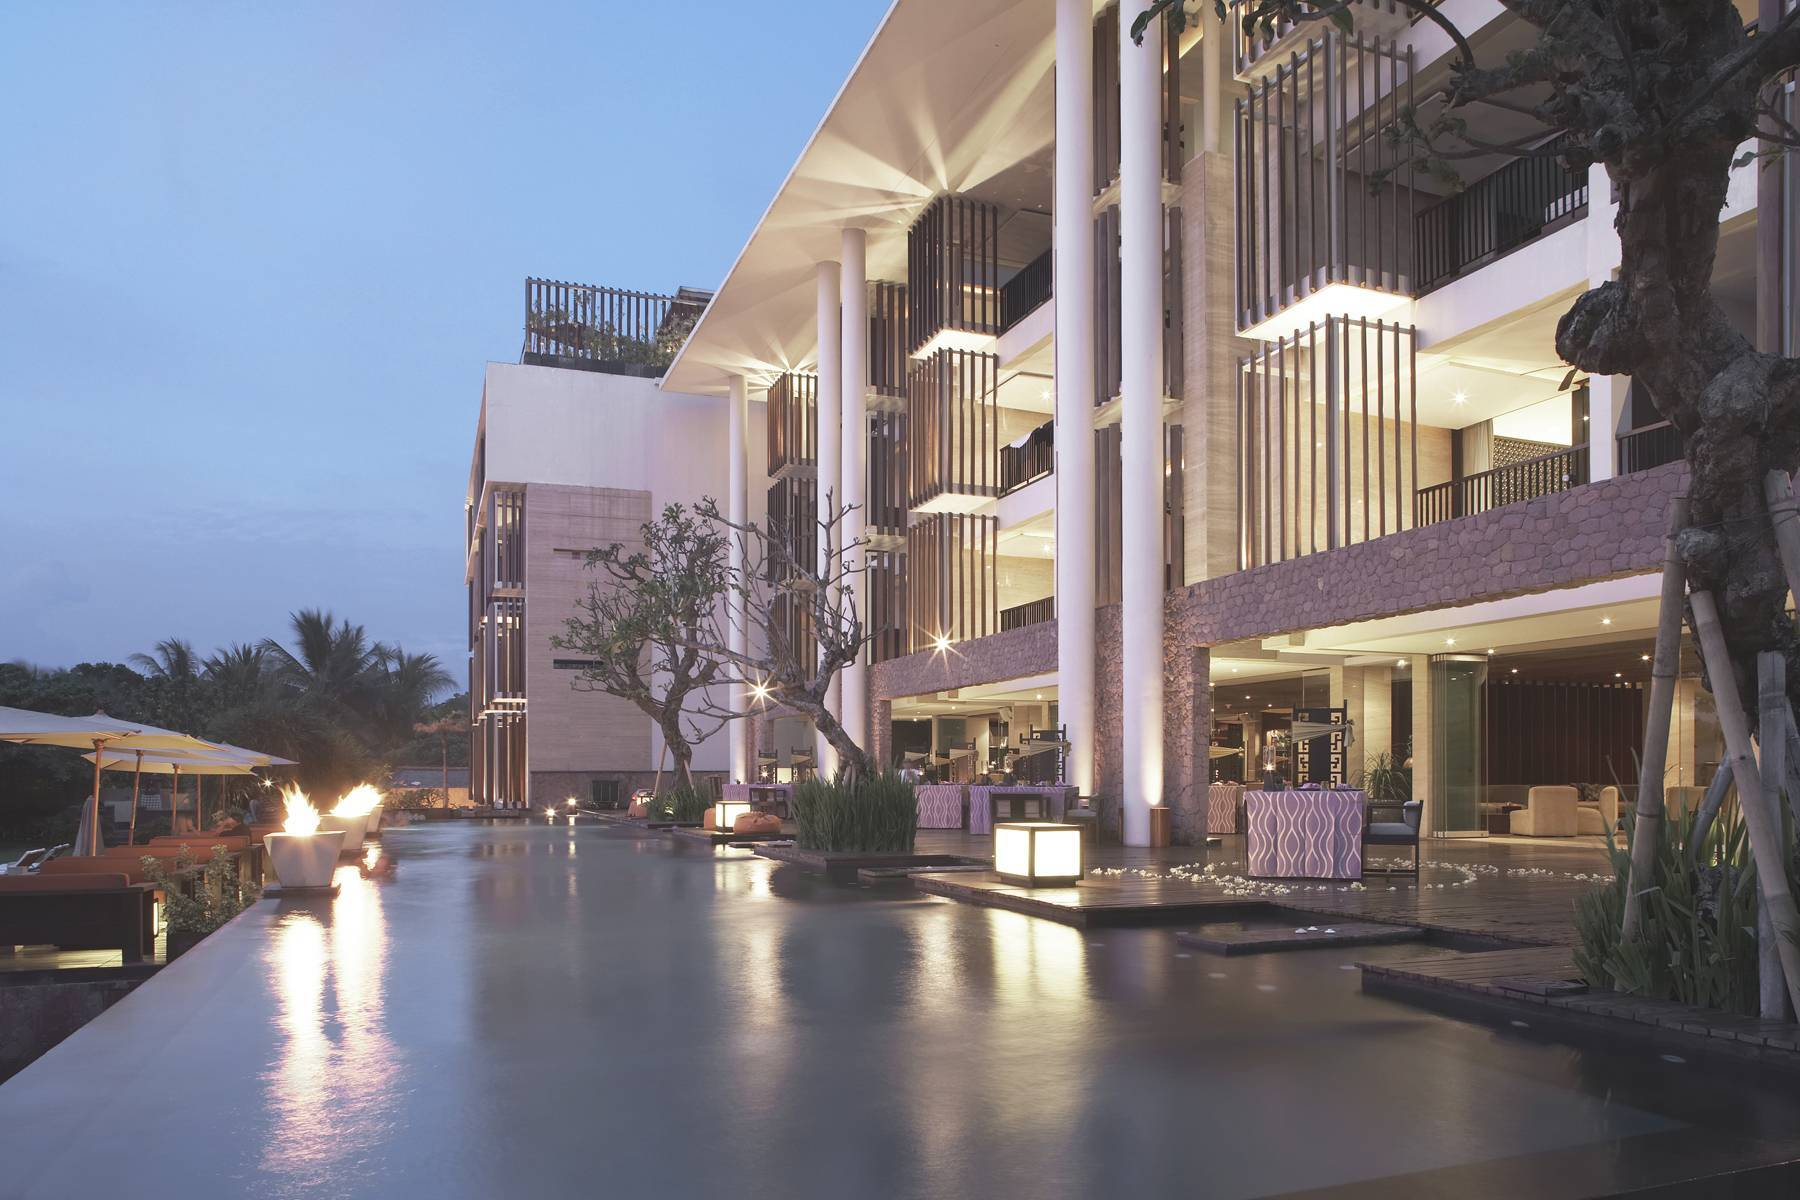 Antony Liu + Ferry Ridwan / Studio Tonton Anantara Seminyak Bali Resort Seminyak, Bali, Indonesia Seminyak, Bali, Indonesia Swimming Pool View Modern  8021